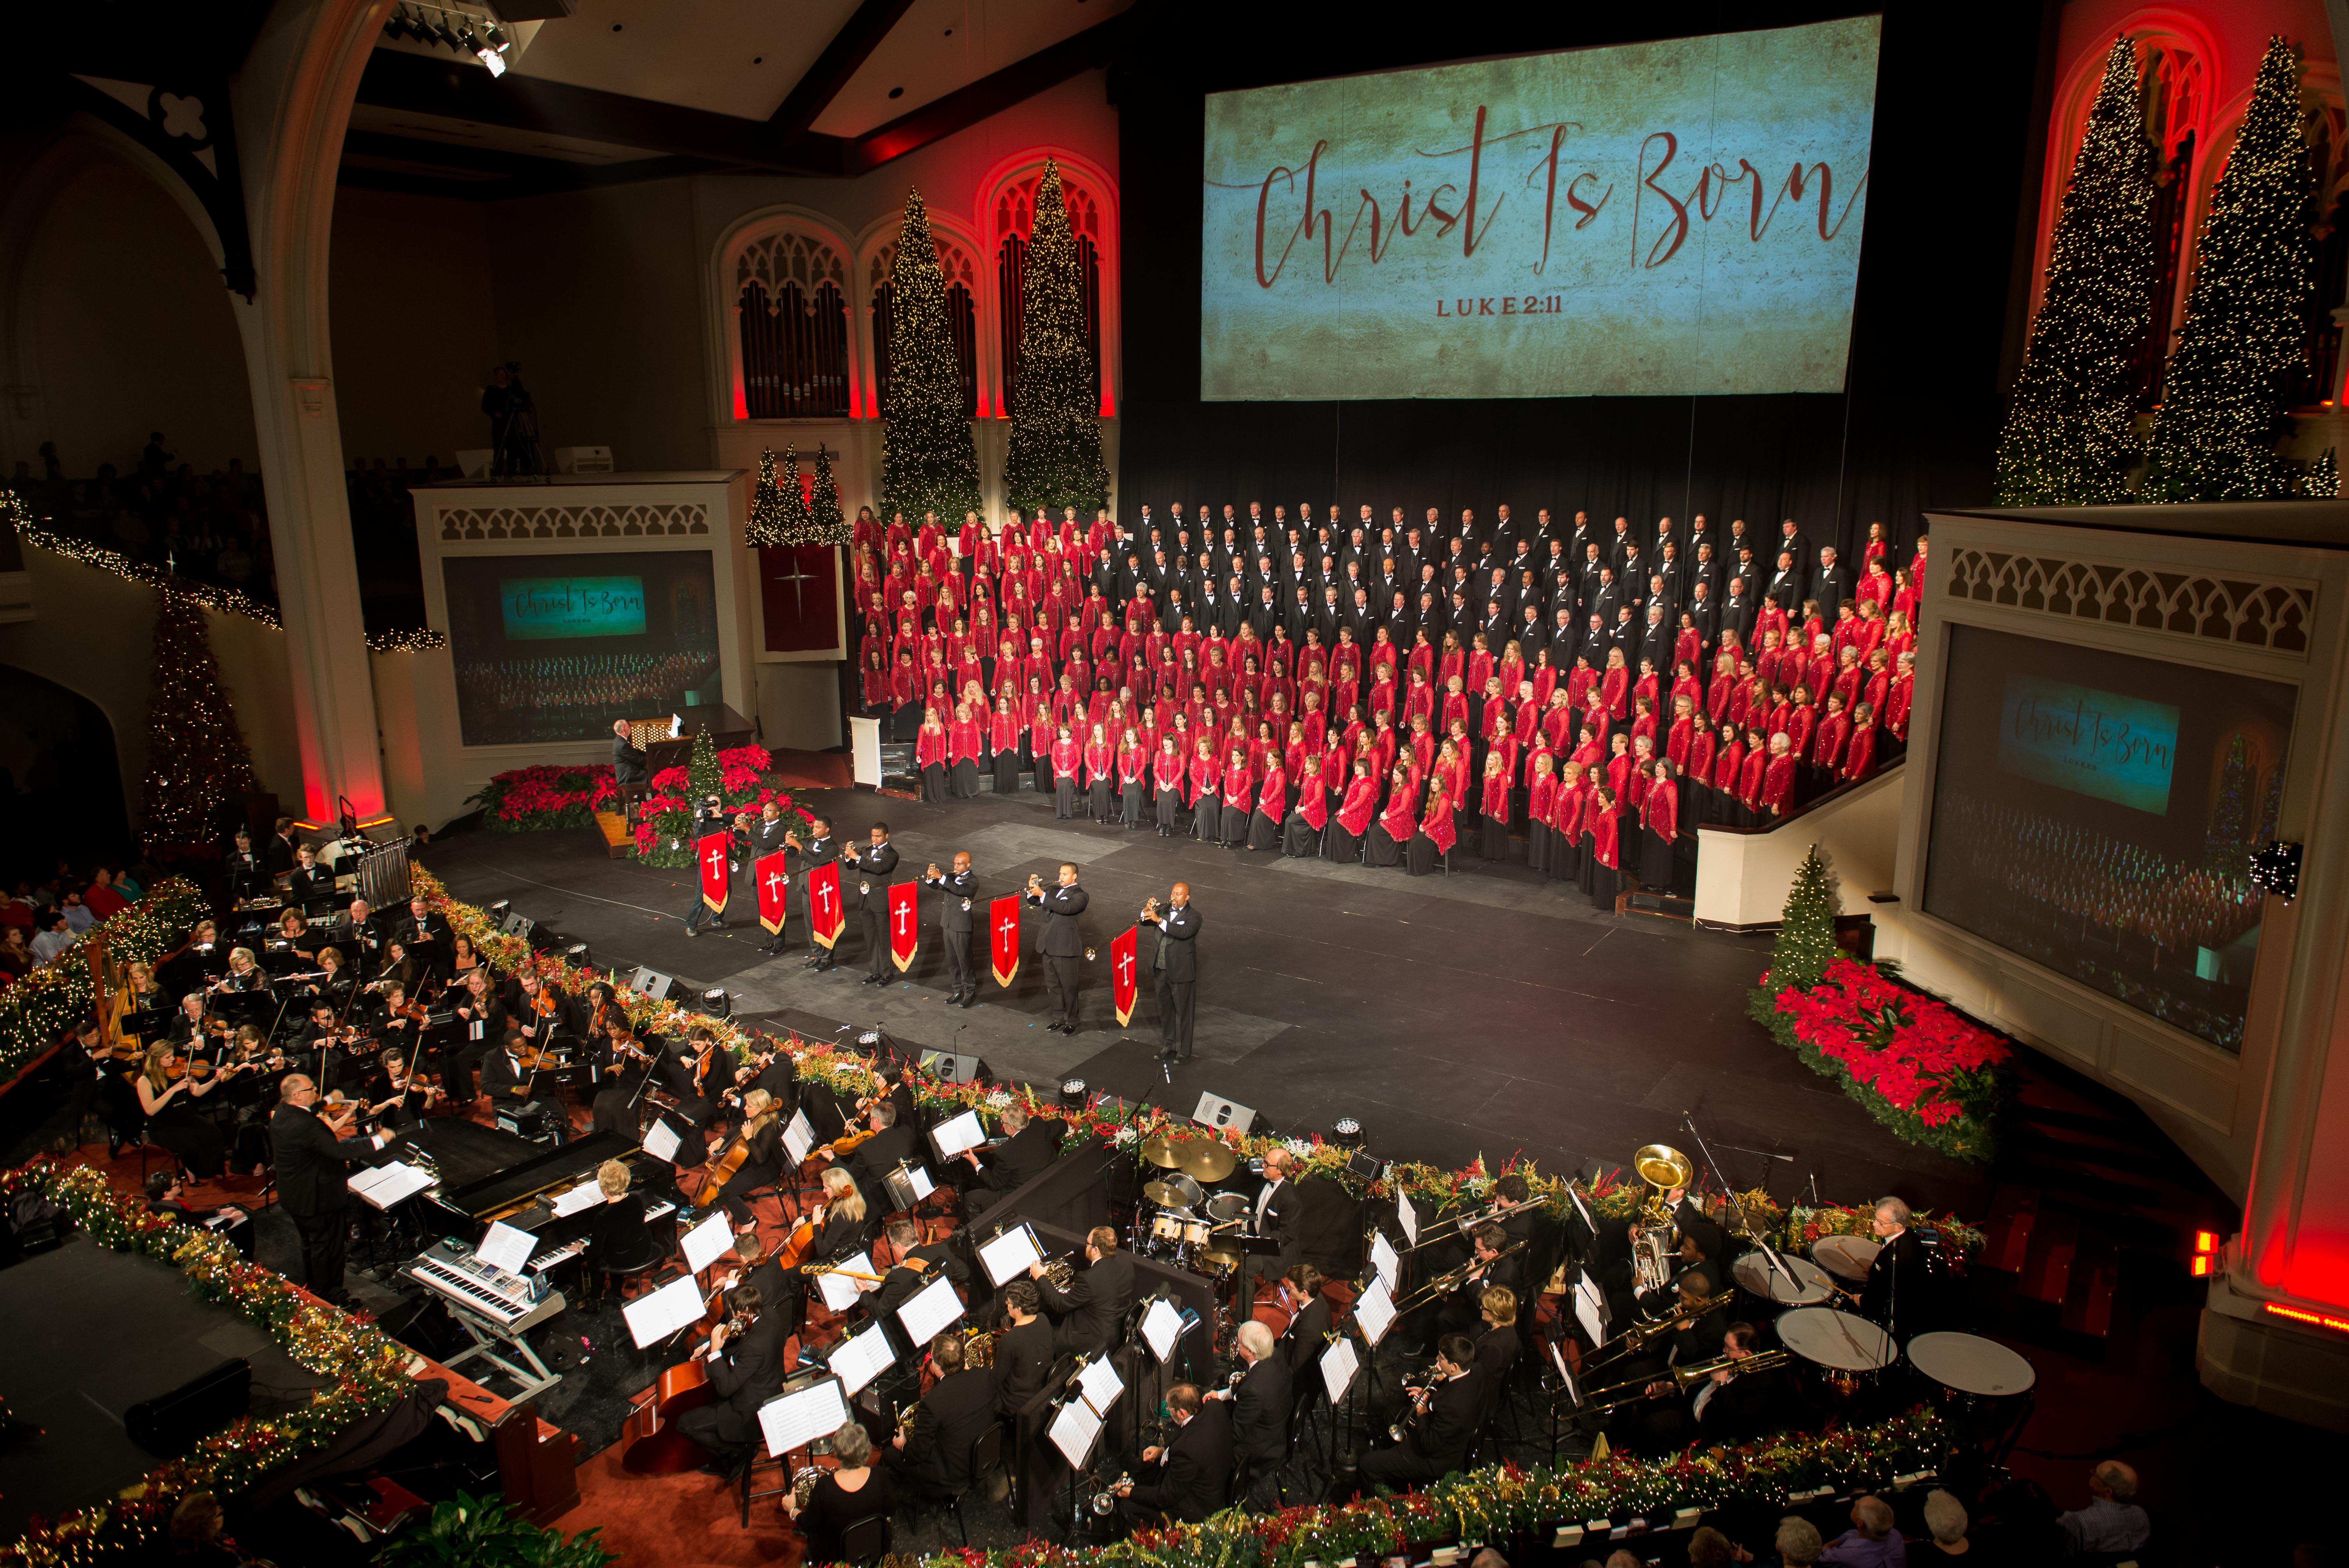 carols2015-choir-and-heralds